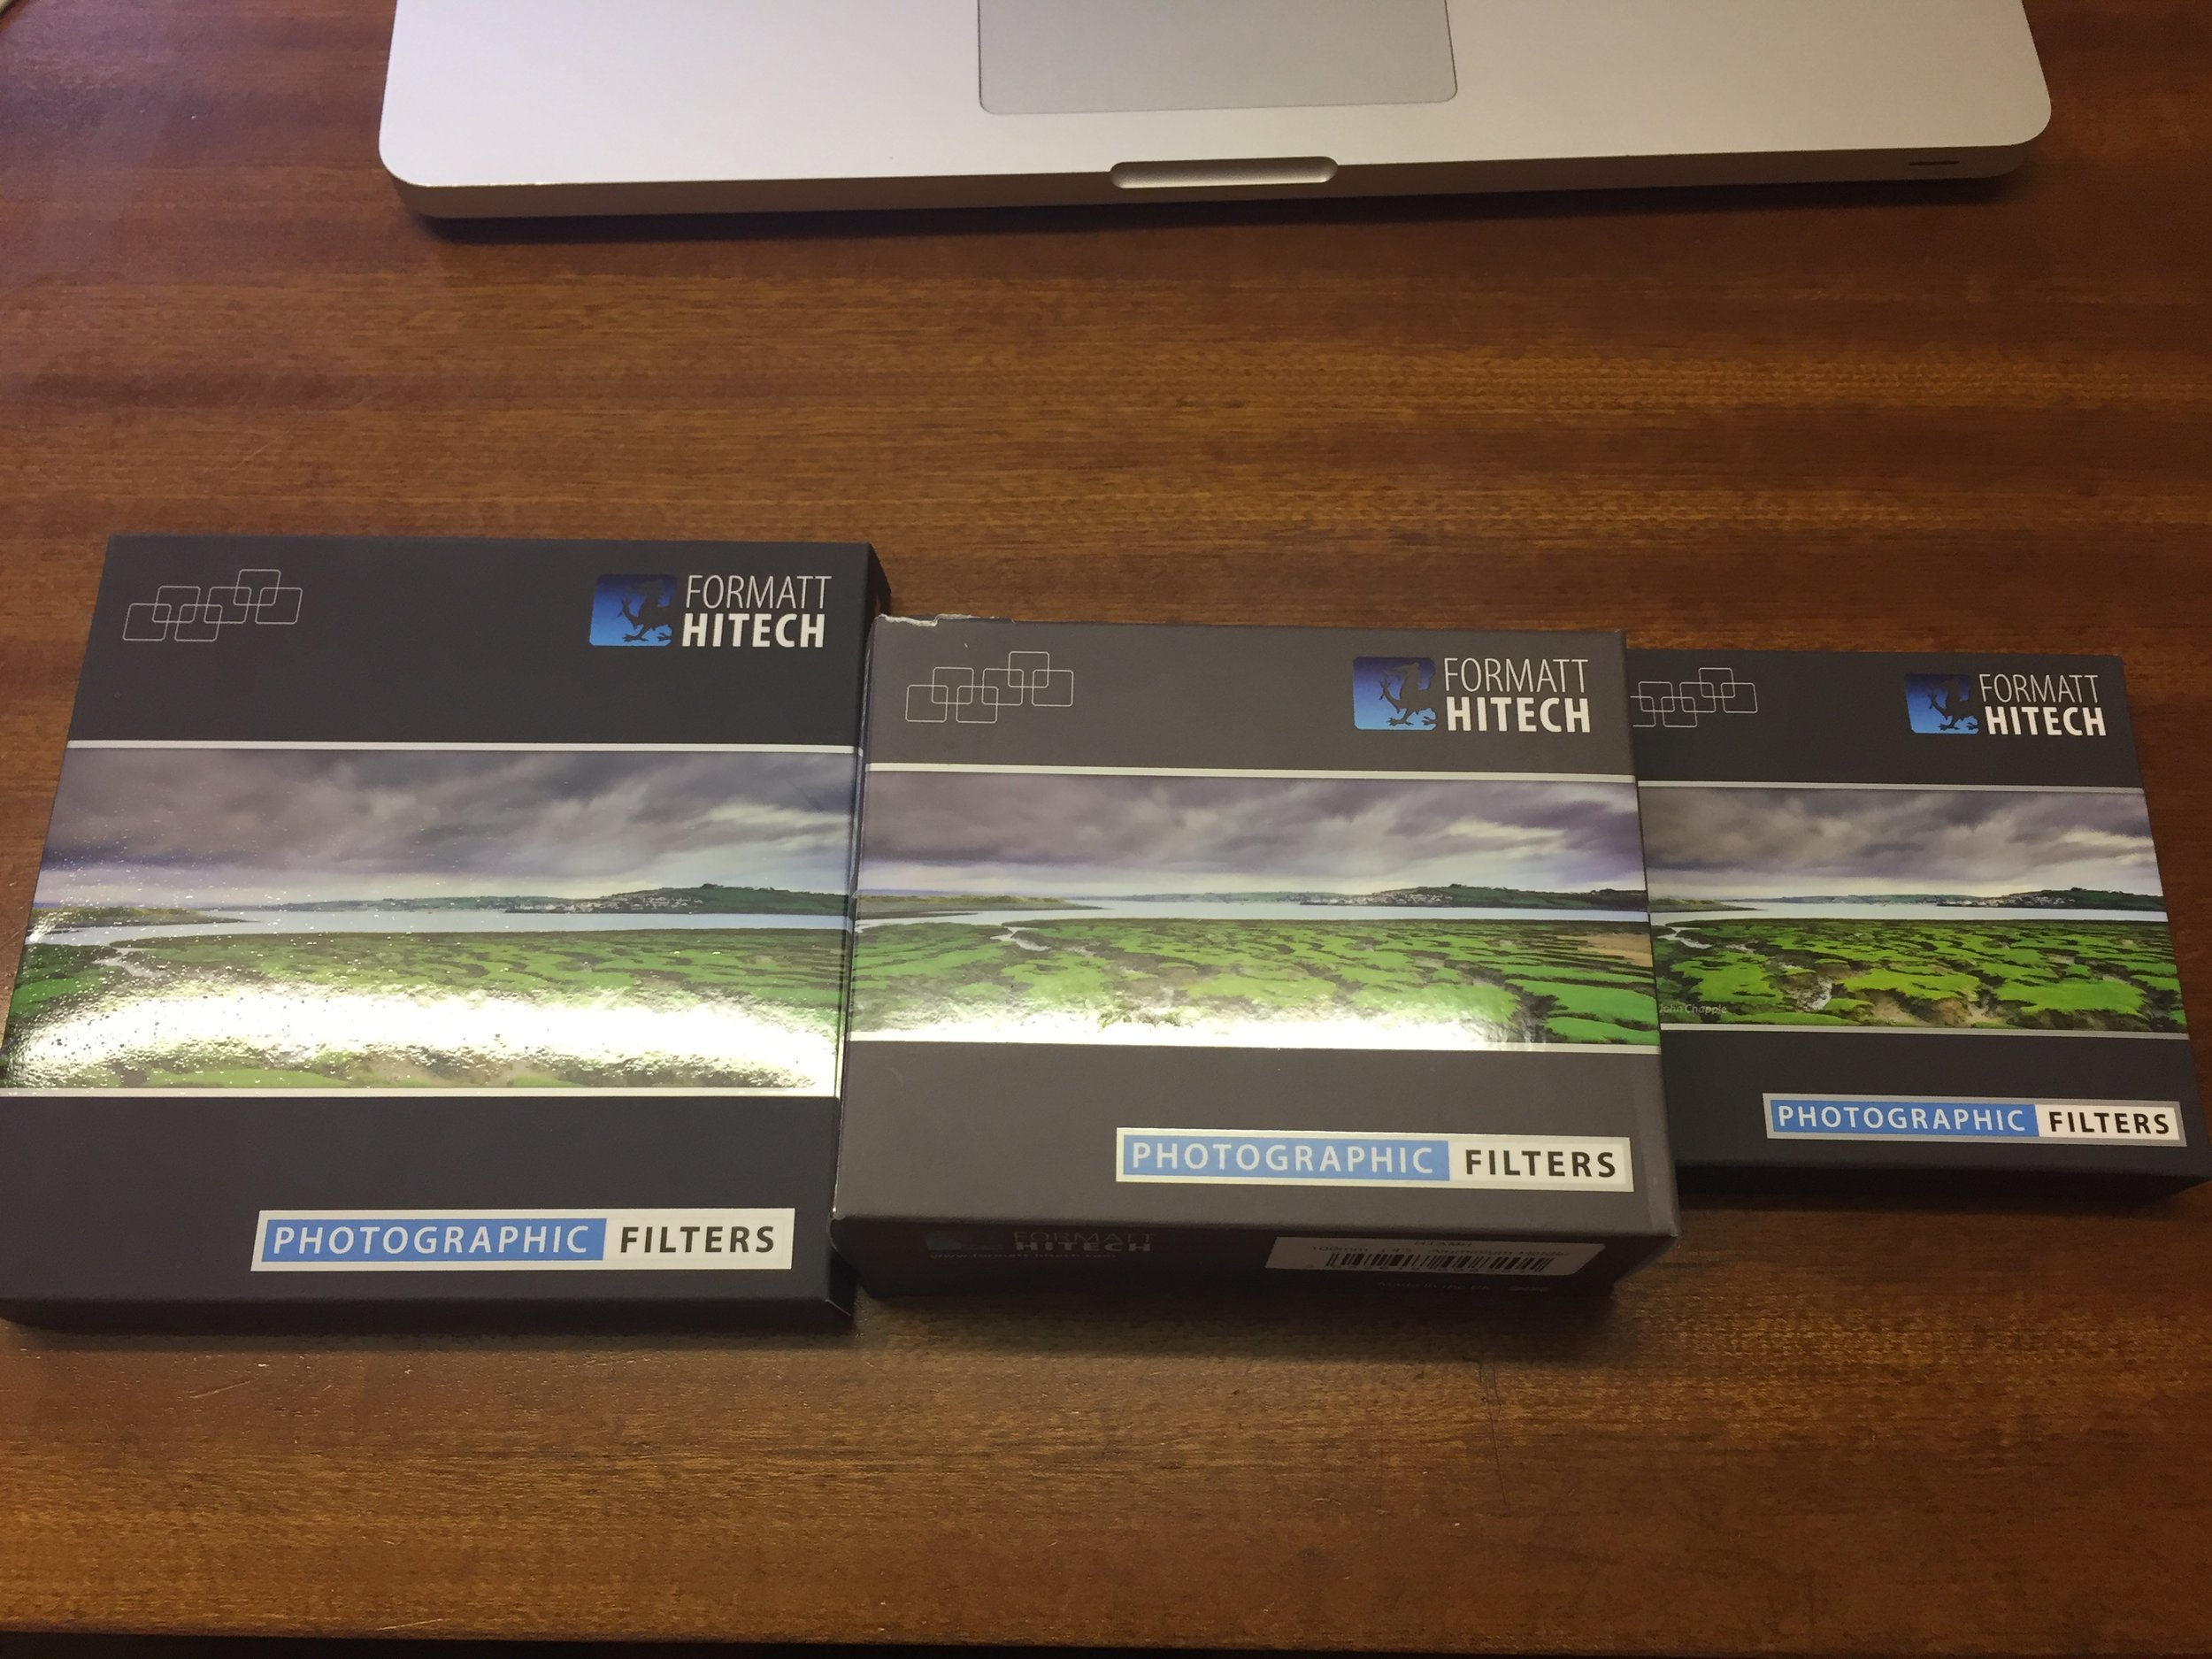 New Formatt Hitech square filters!